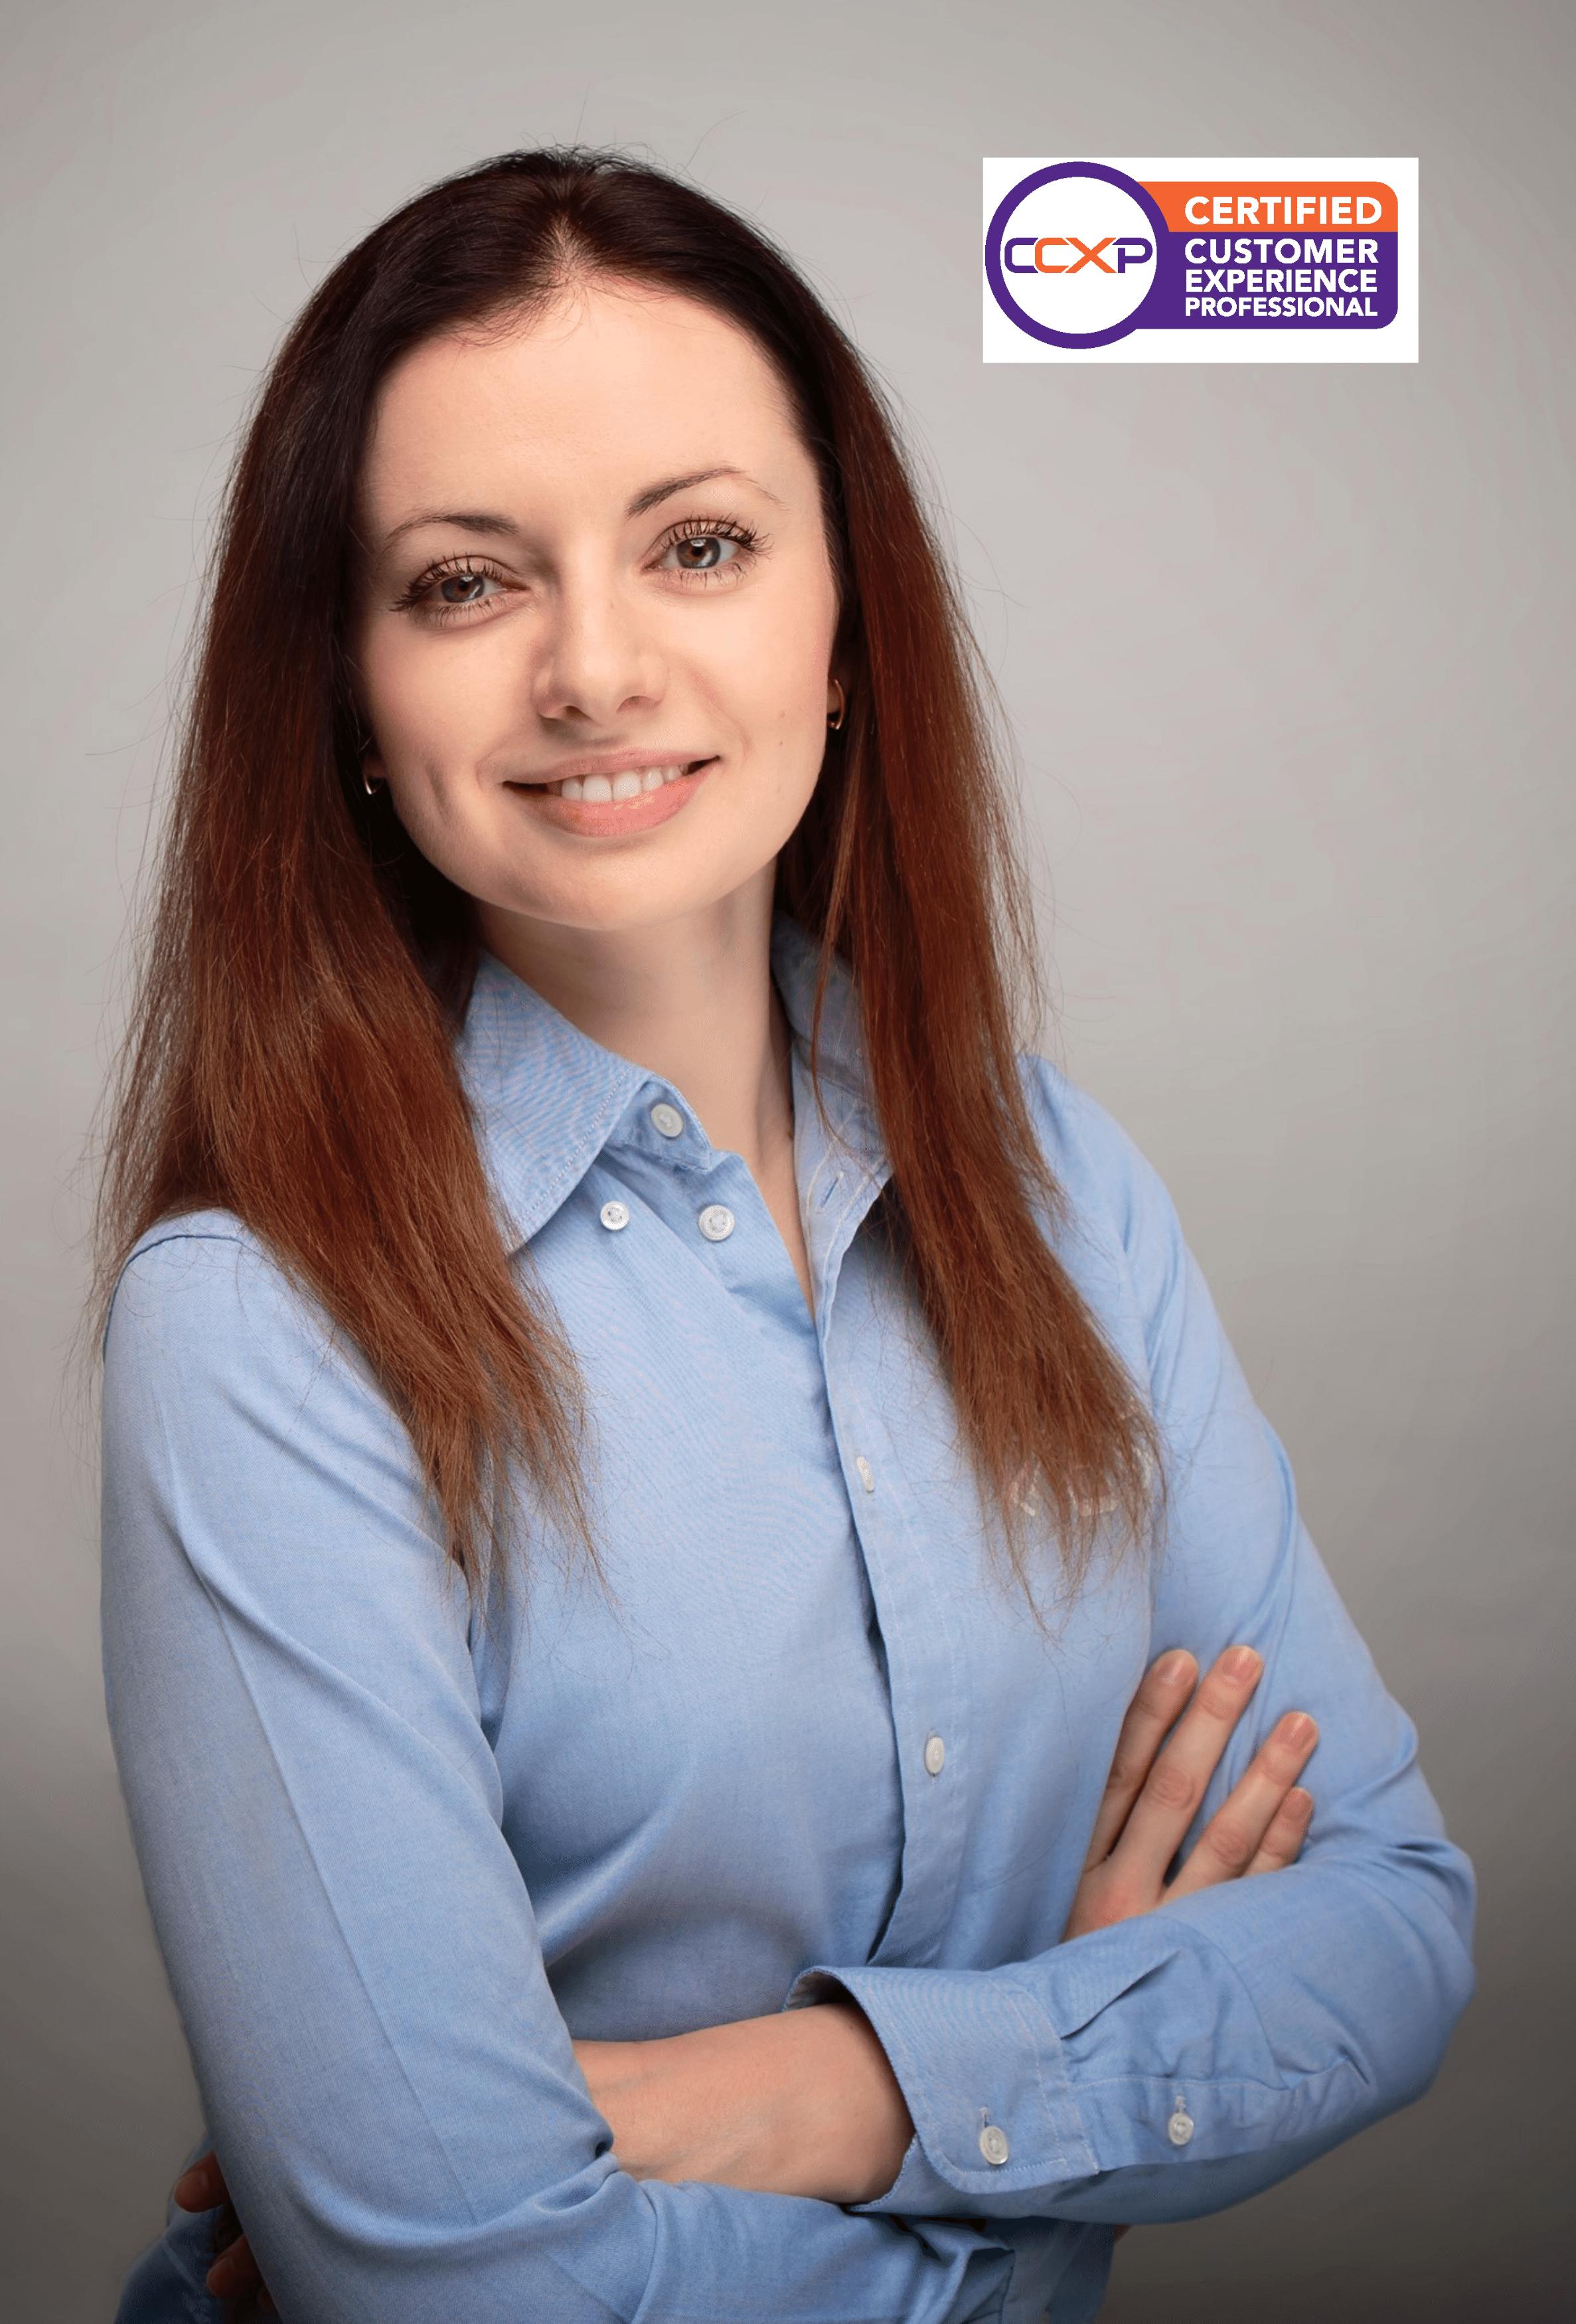 Iryna Sheremetieva, CCXP, Data Geek